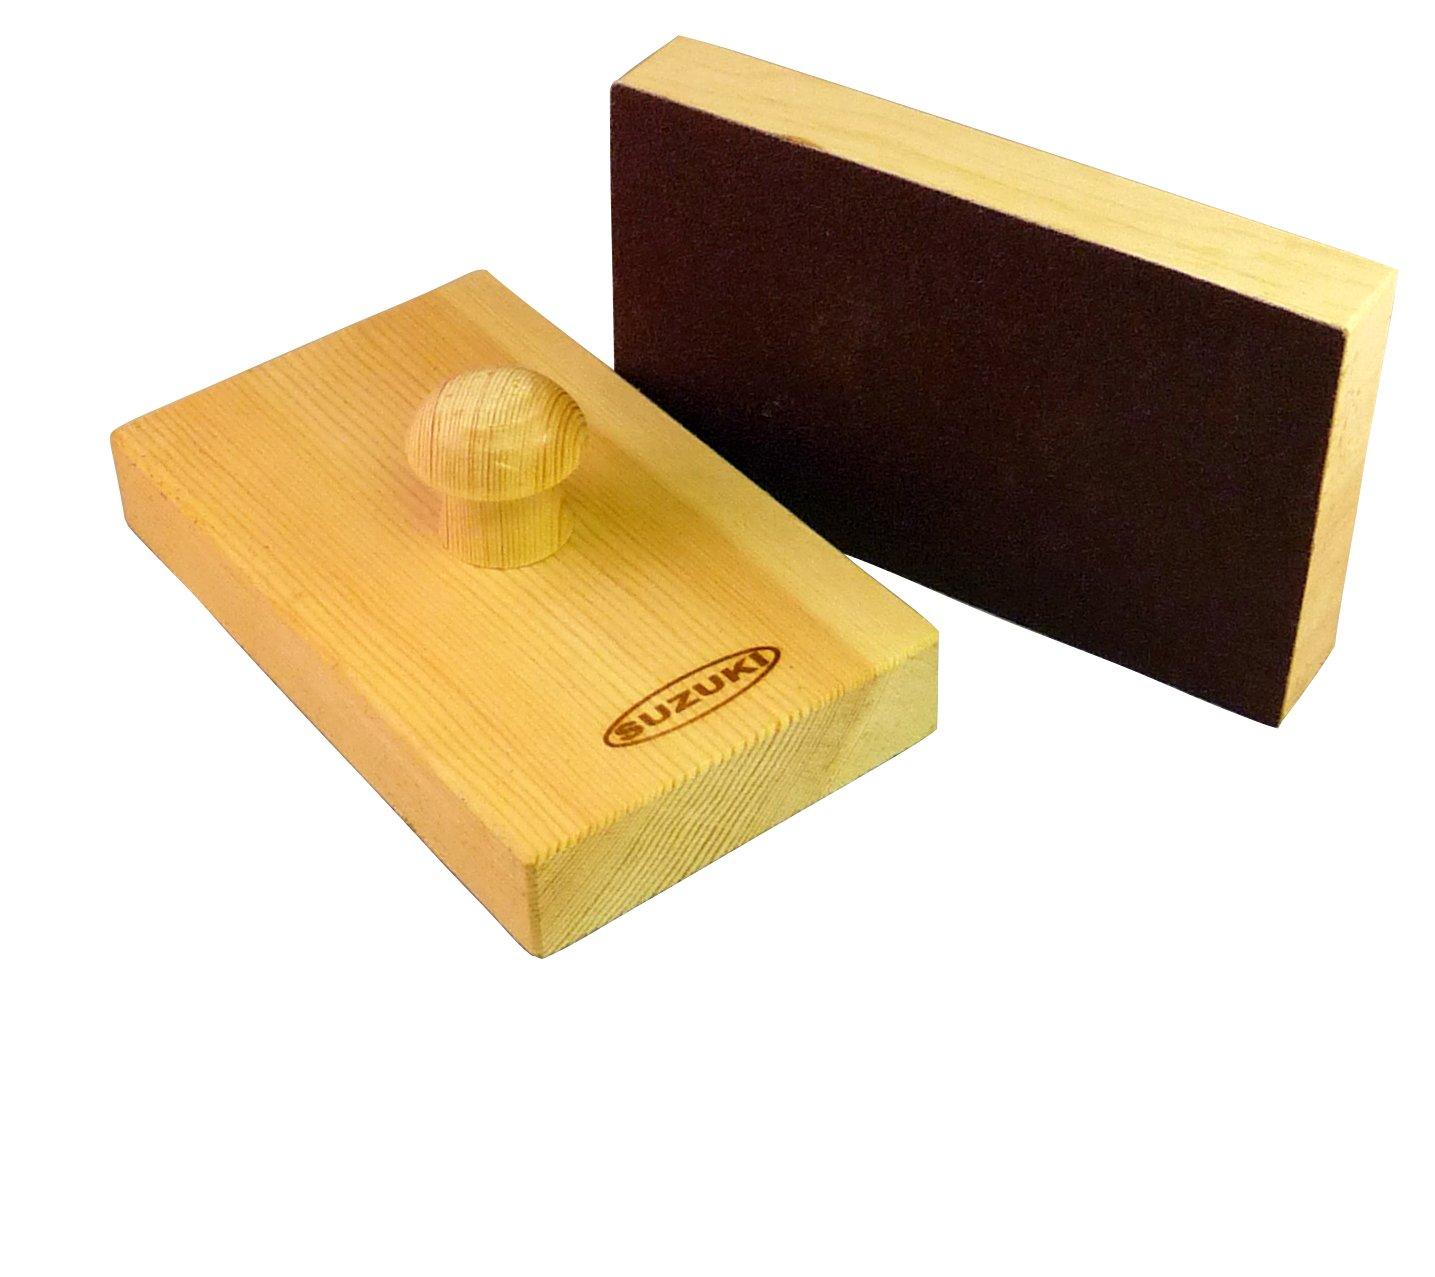 Suzuki Musical Instrument Corporation SB-100 Sand Blocks - Pair